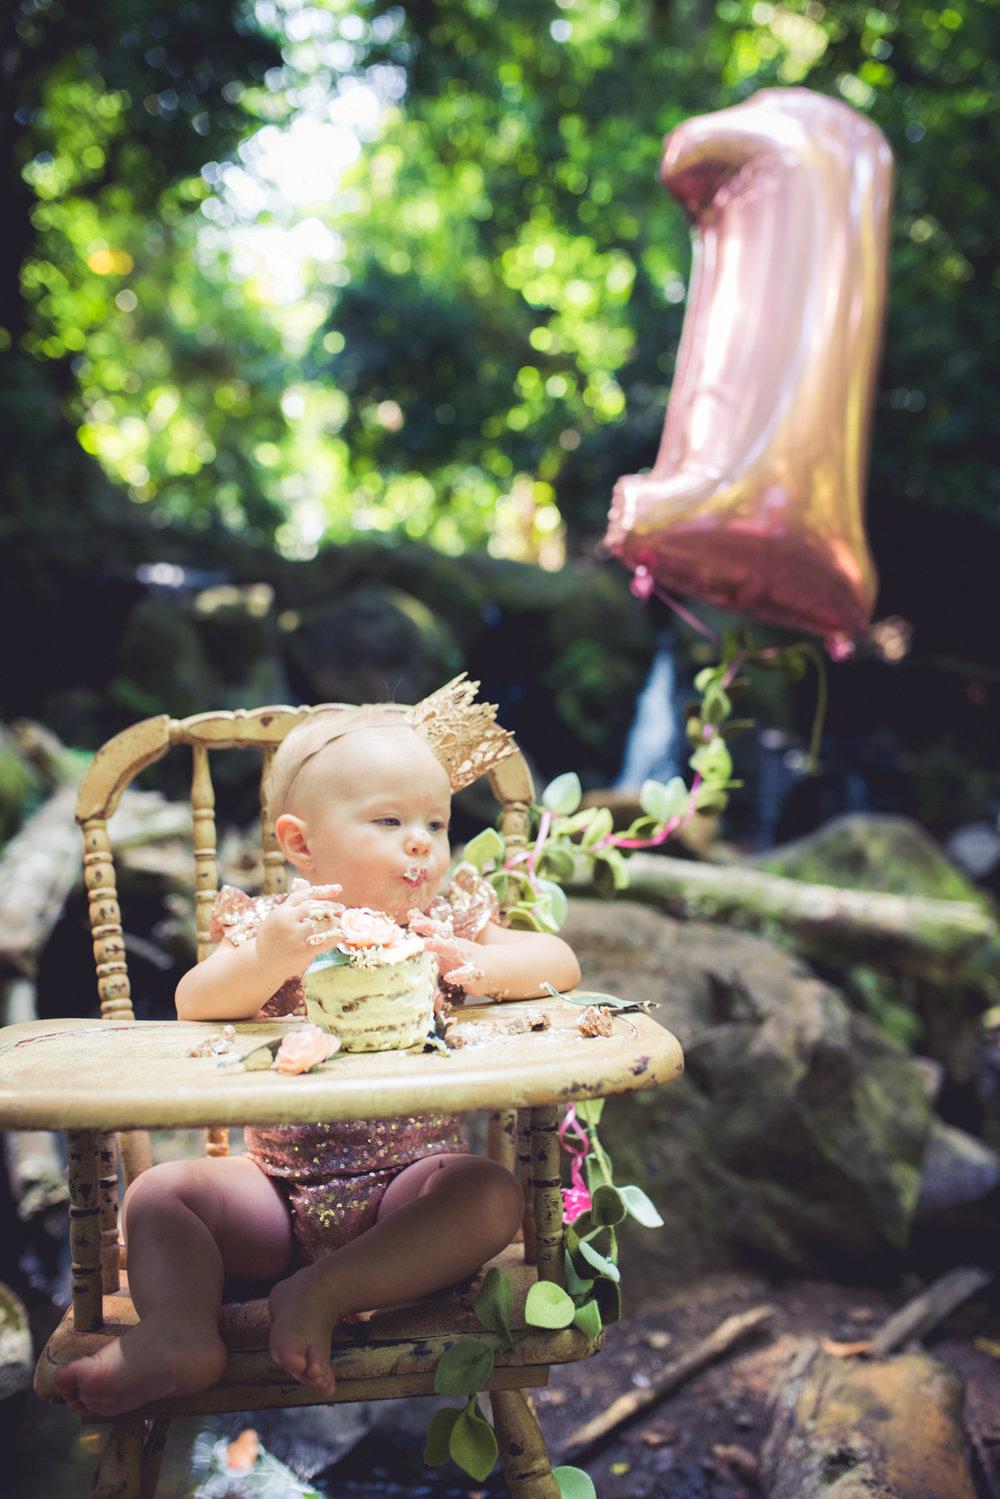 amberdeciccophotography-birthday-oneyear-cakesmash-25.jpg